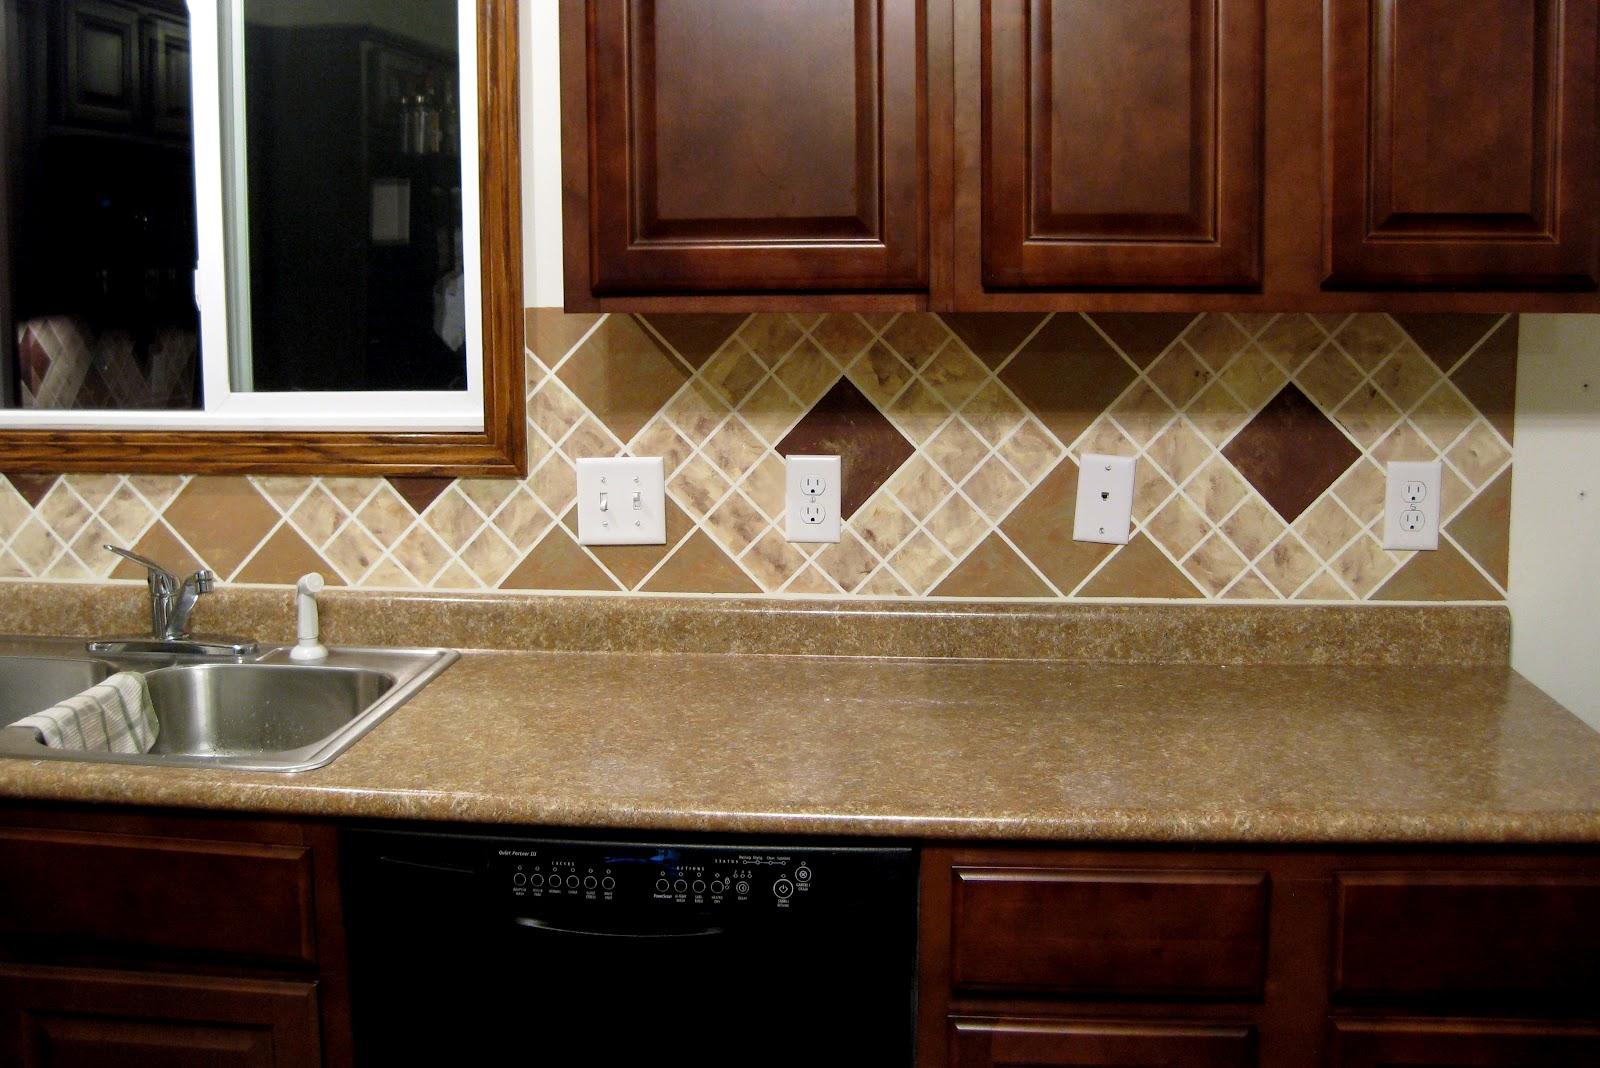 Painting Kitchen Tiles: Painted Backsplash Tutorial!!